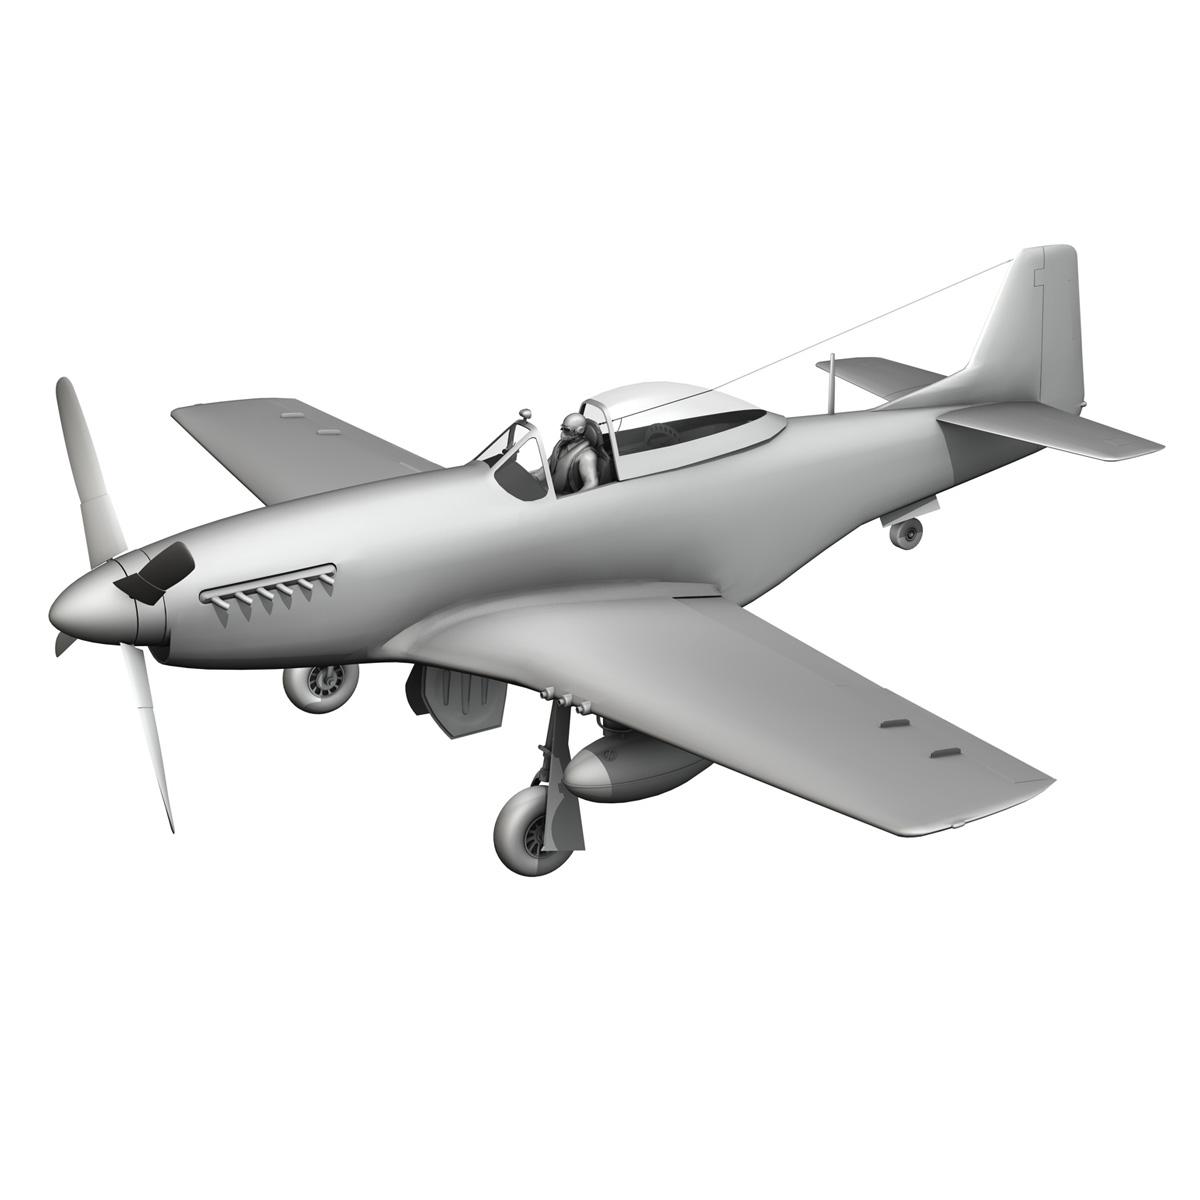 north american p-51d mustang – lou iv 3d model fbx c4d lwo obj 272616